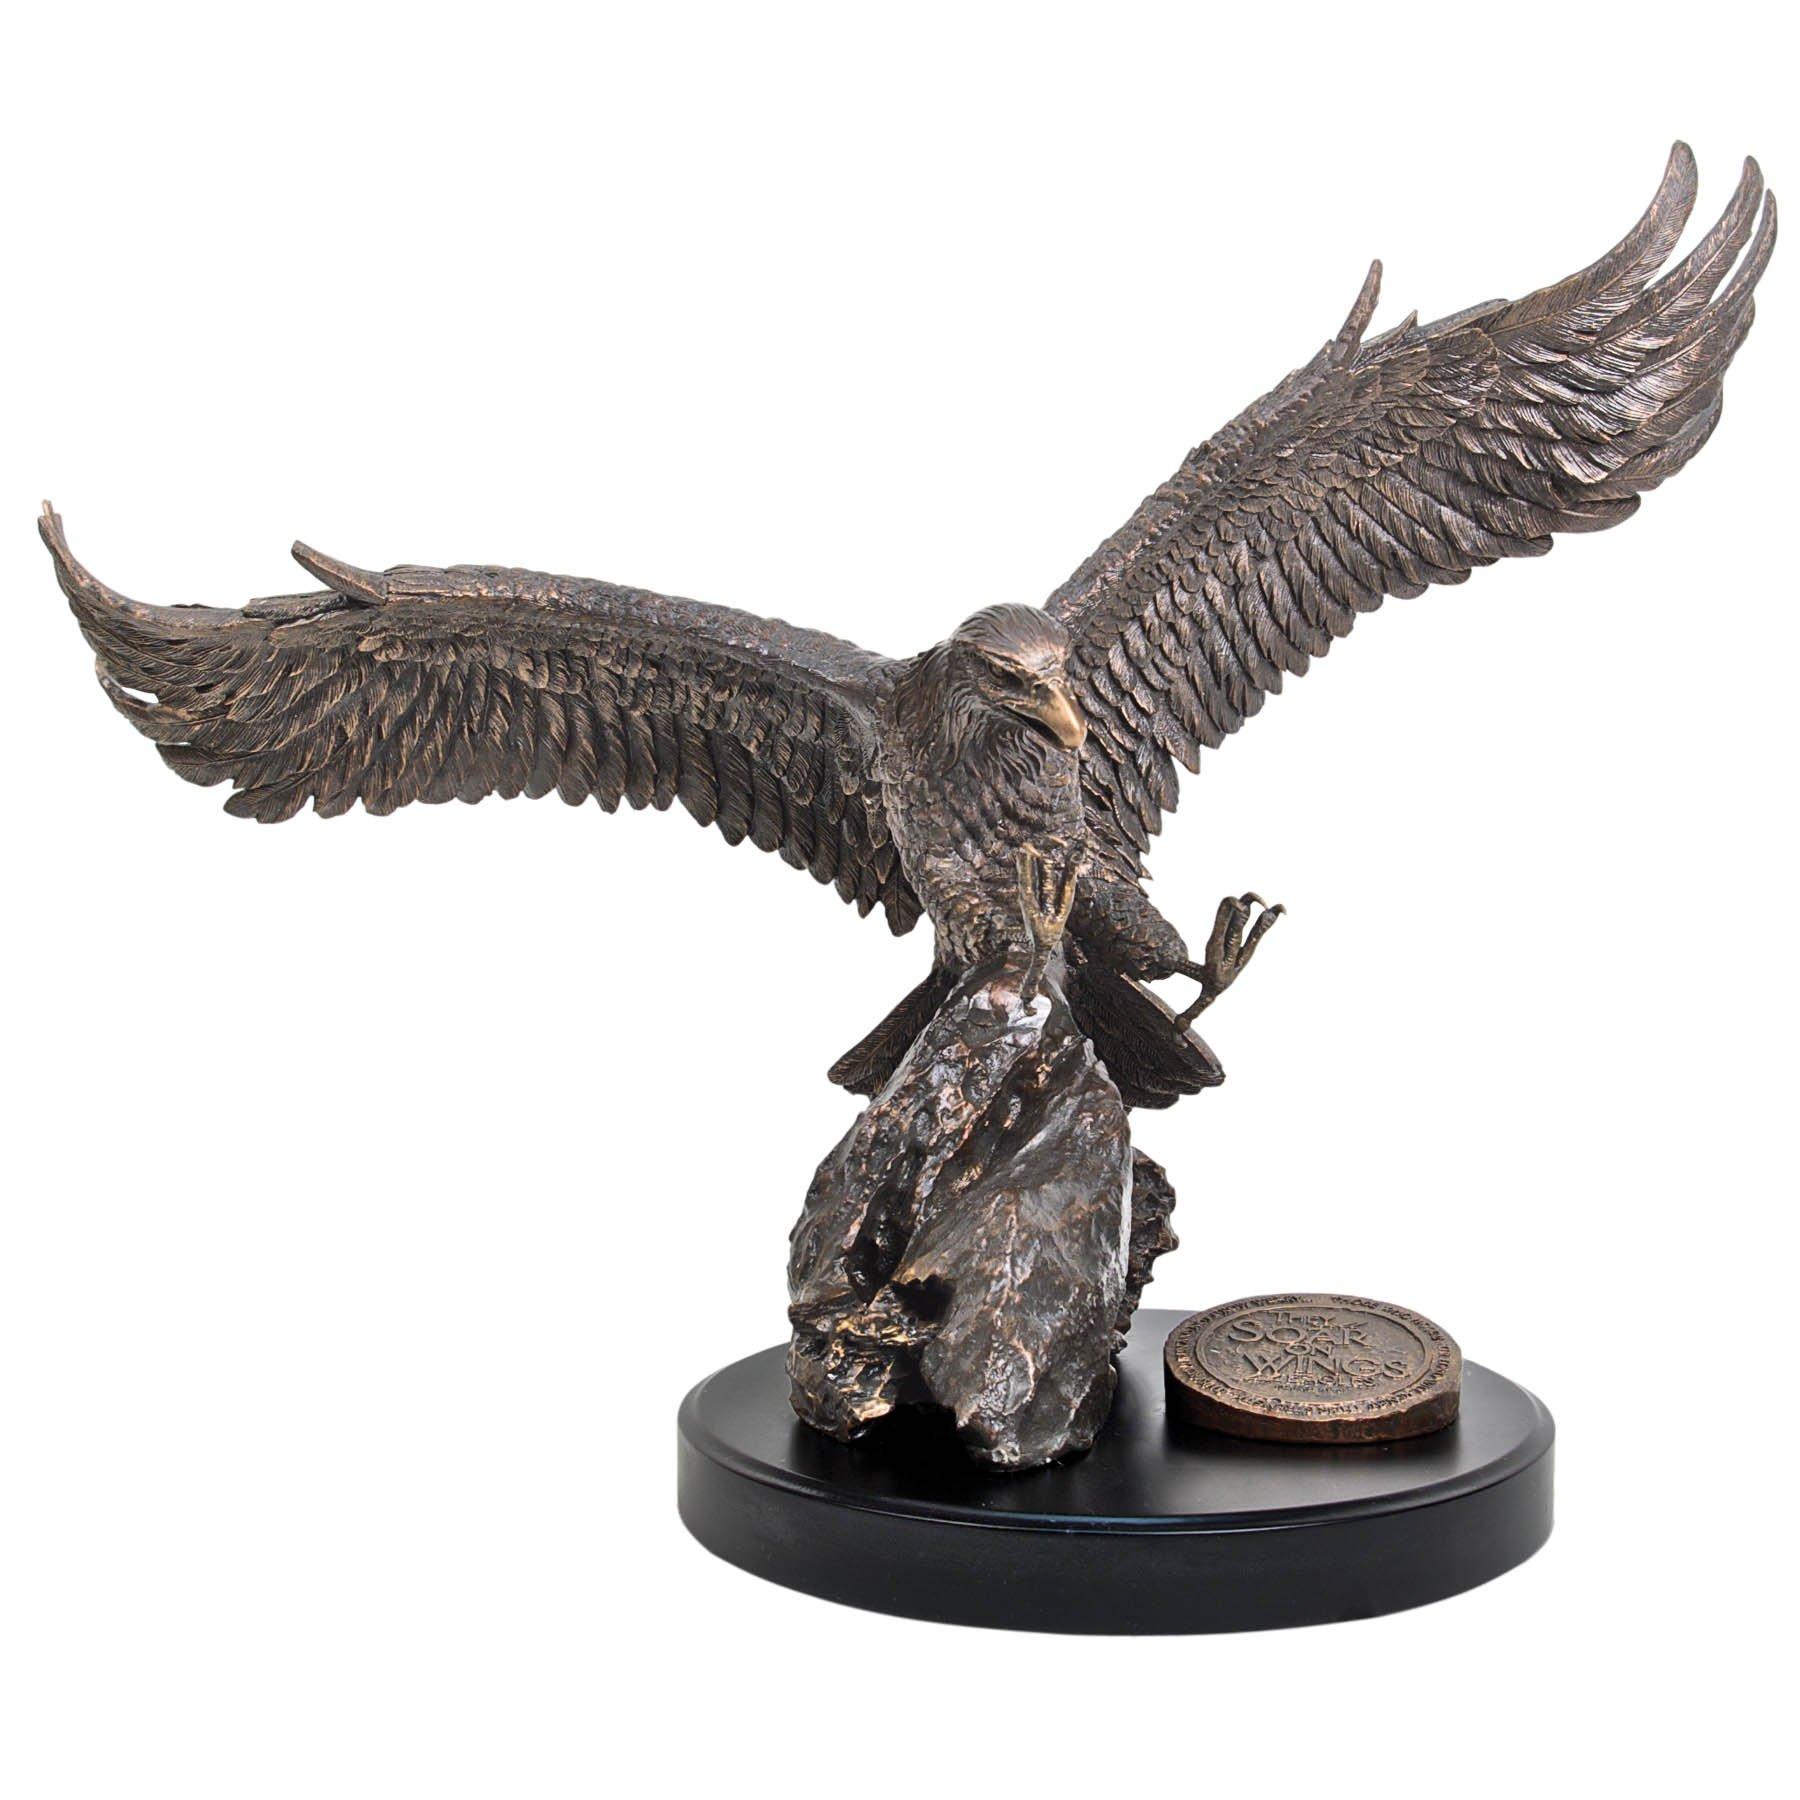 Lighthouse Christian Products Moments of Faith XL Eagle Sculpture, 21 1/2 x 15'' by Lighthouse Christian Products